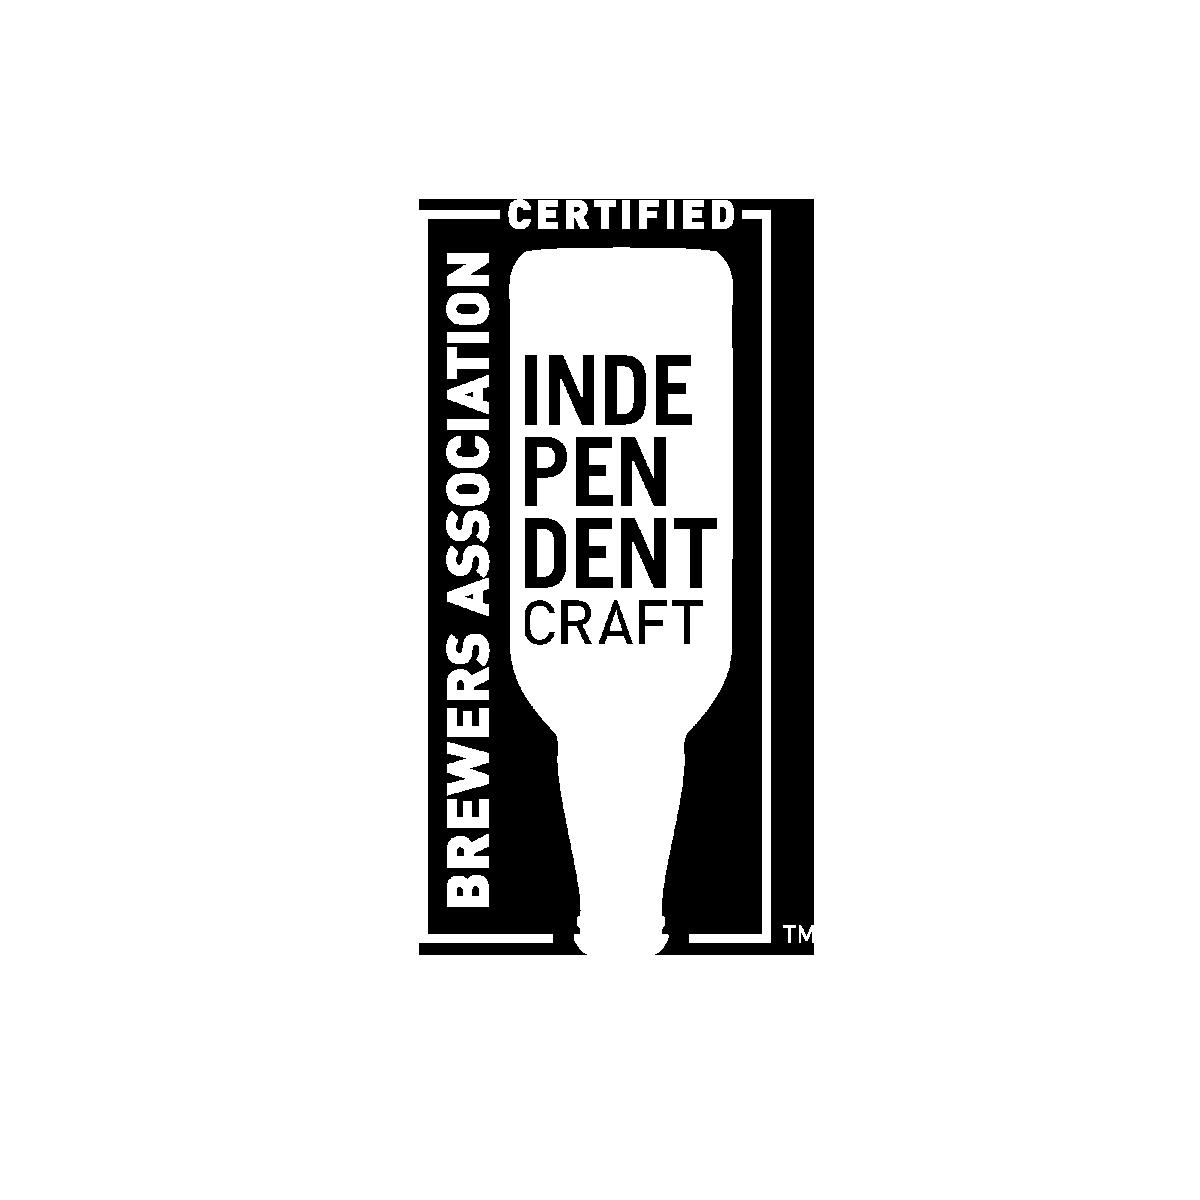 Indep Craft Brewer Seal REVERSED WEBSITE.png